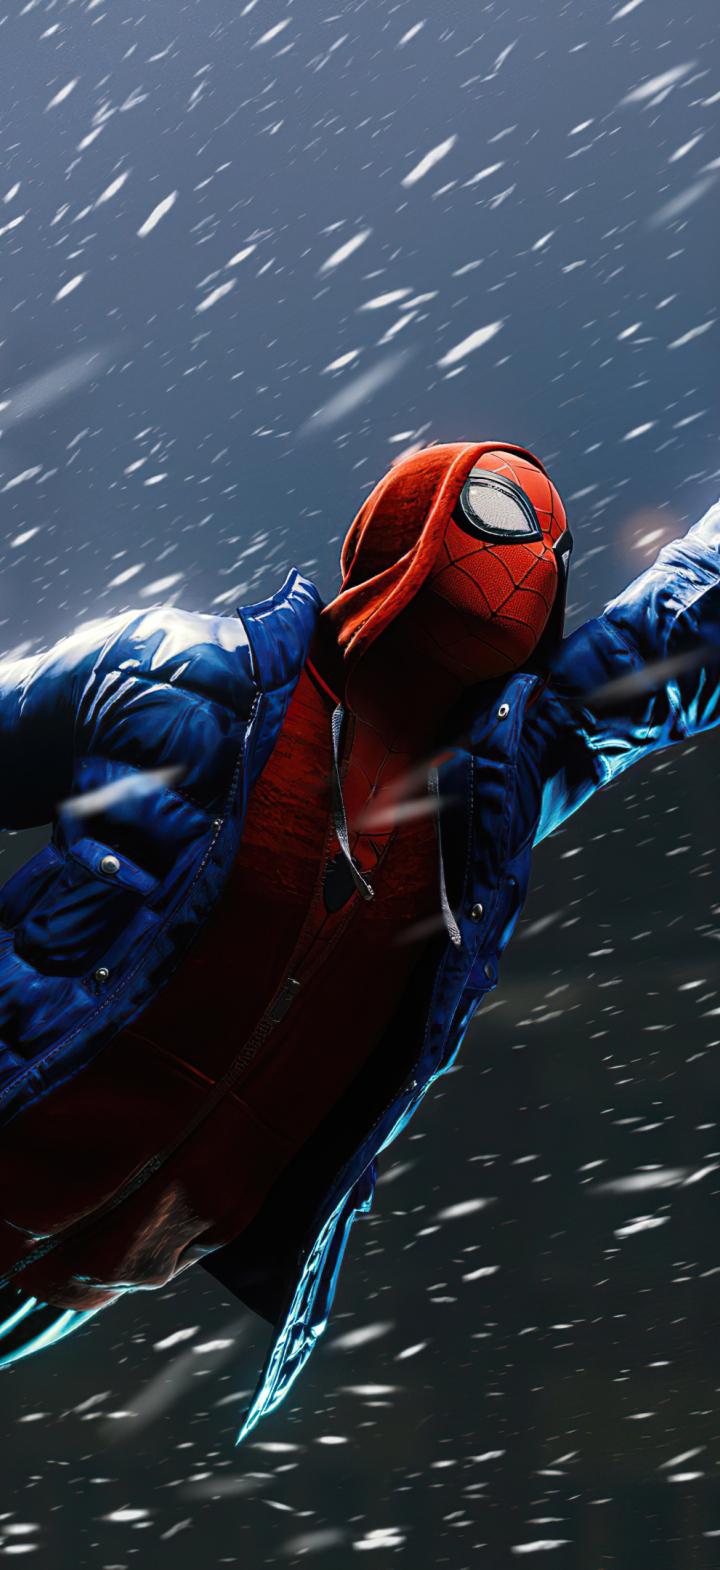 720x1570 Flying Miles Morales Marvels Spider-Man 720x1570 ...